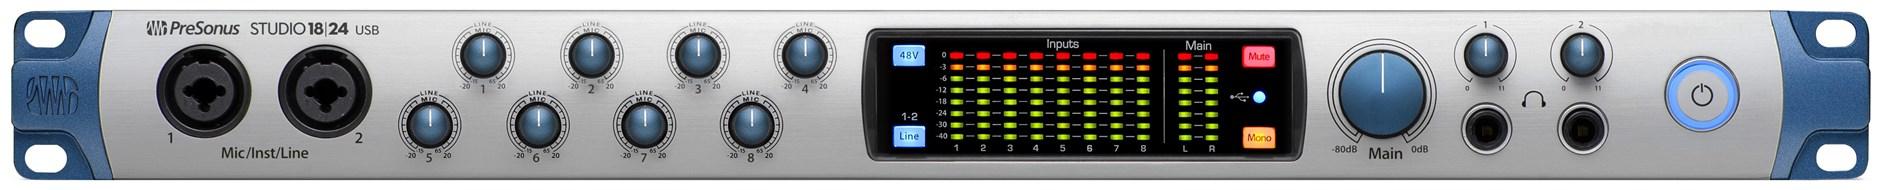 Presonus Studio 1824 USB Audio Interface